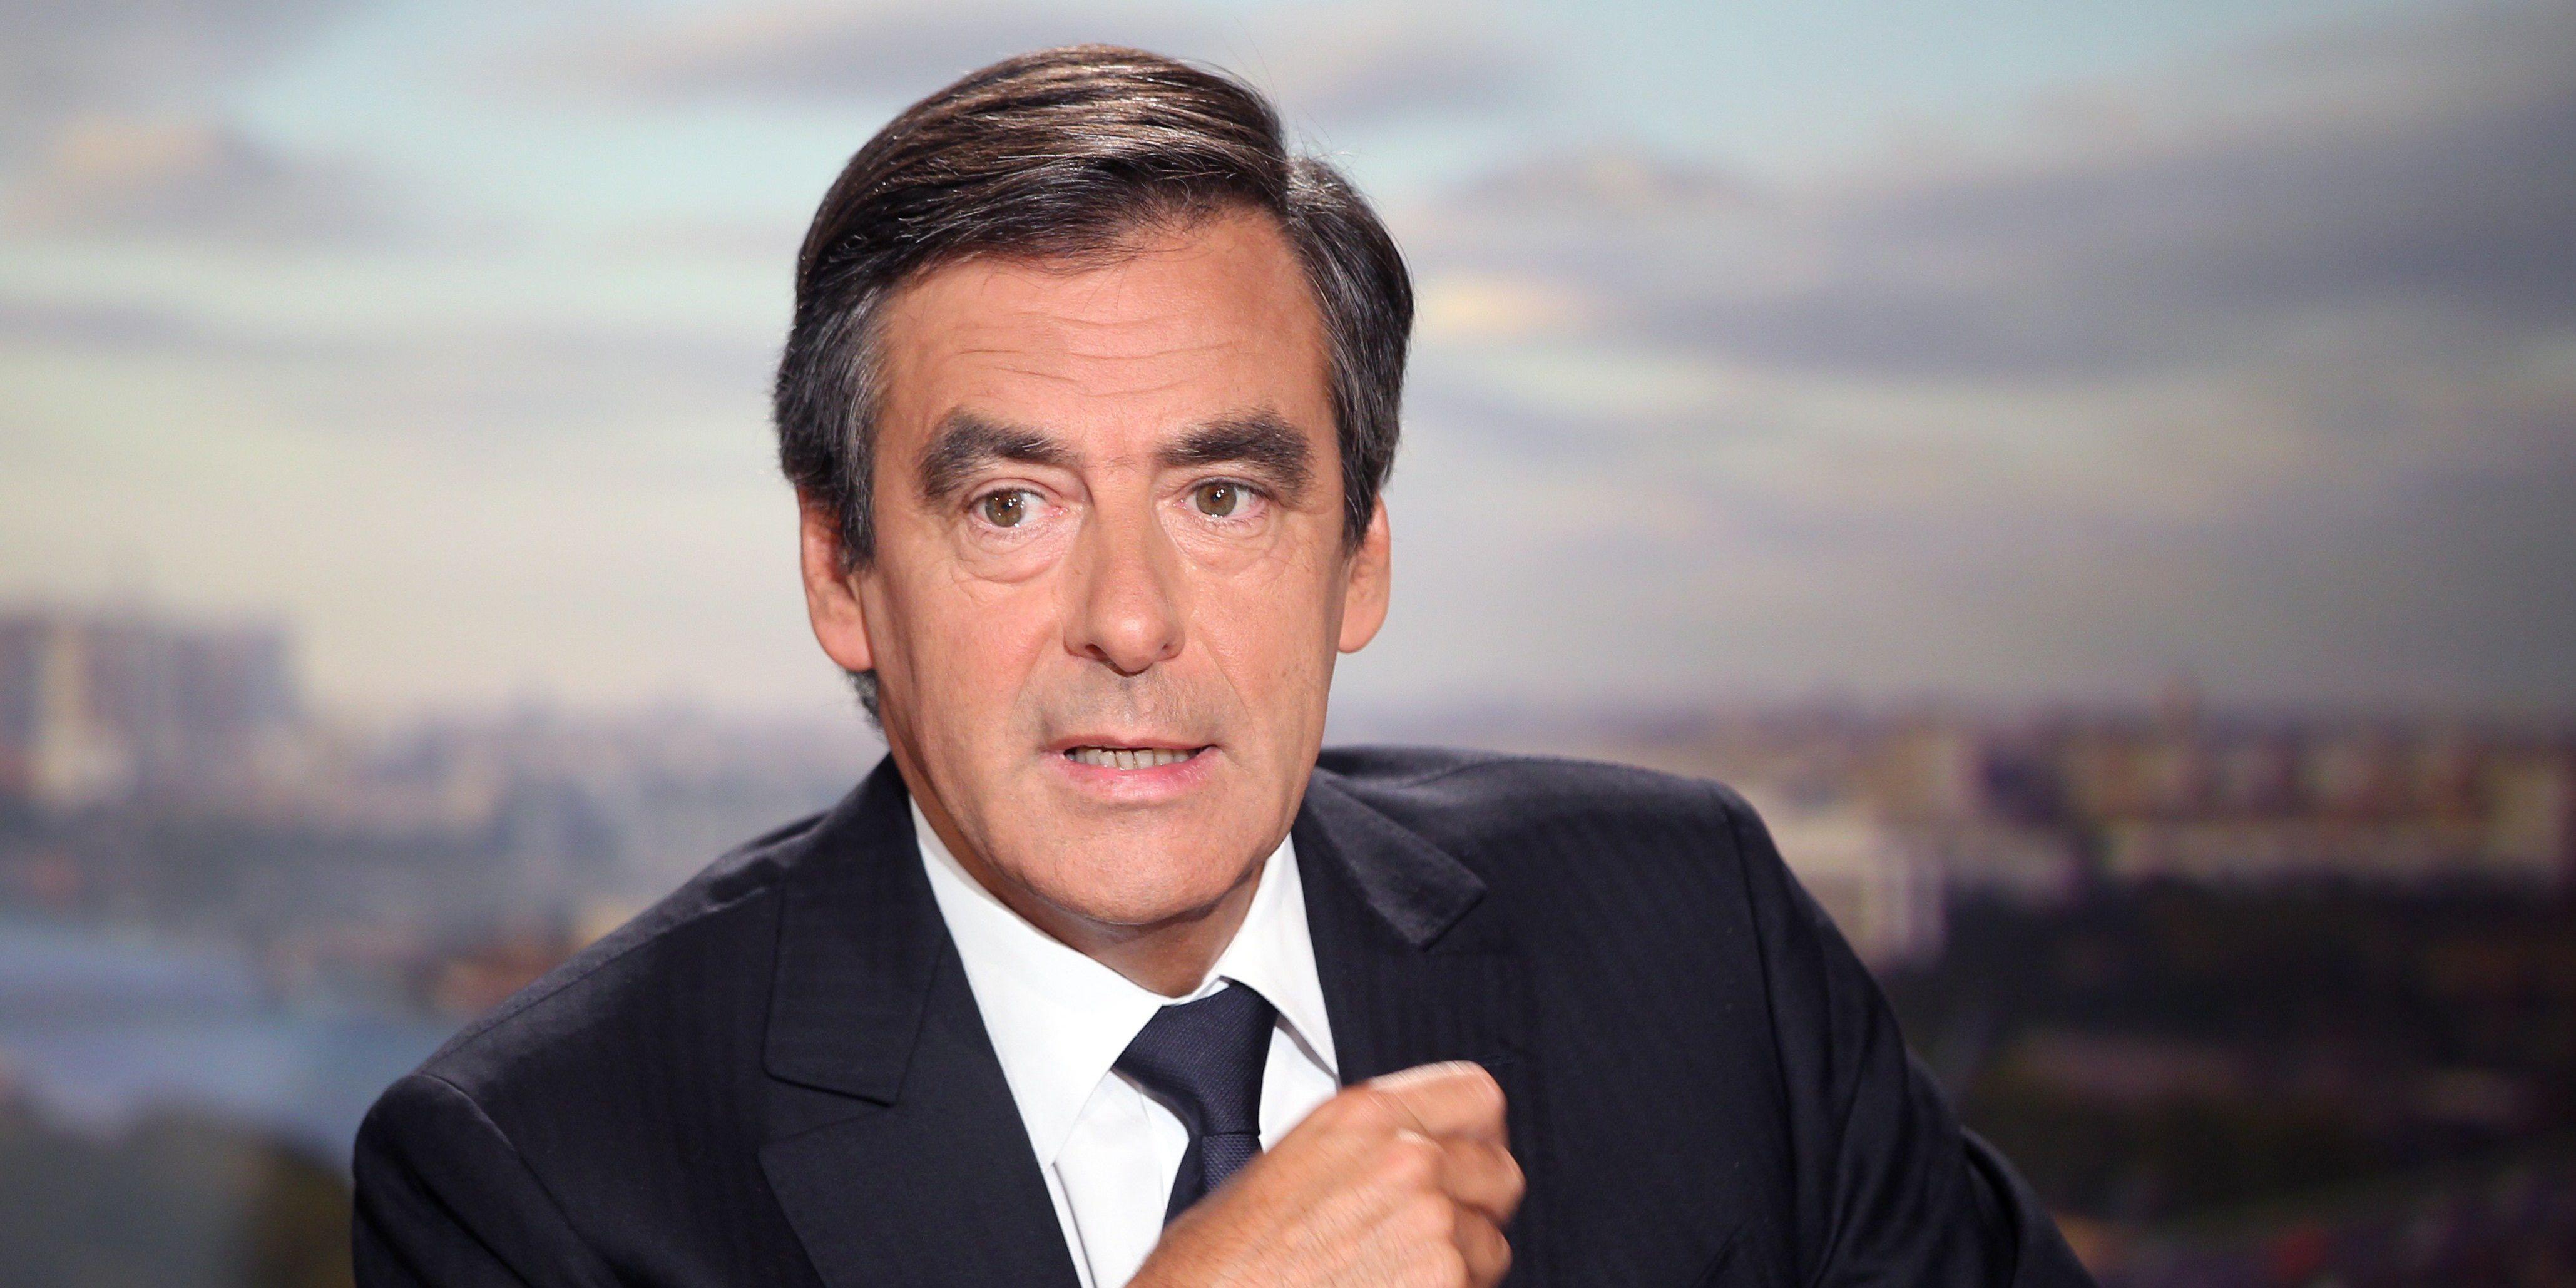 Il vincitore delle primarie francesi François Fillon